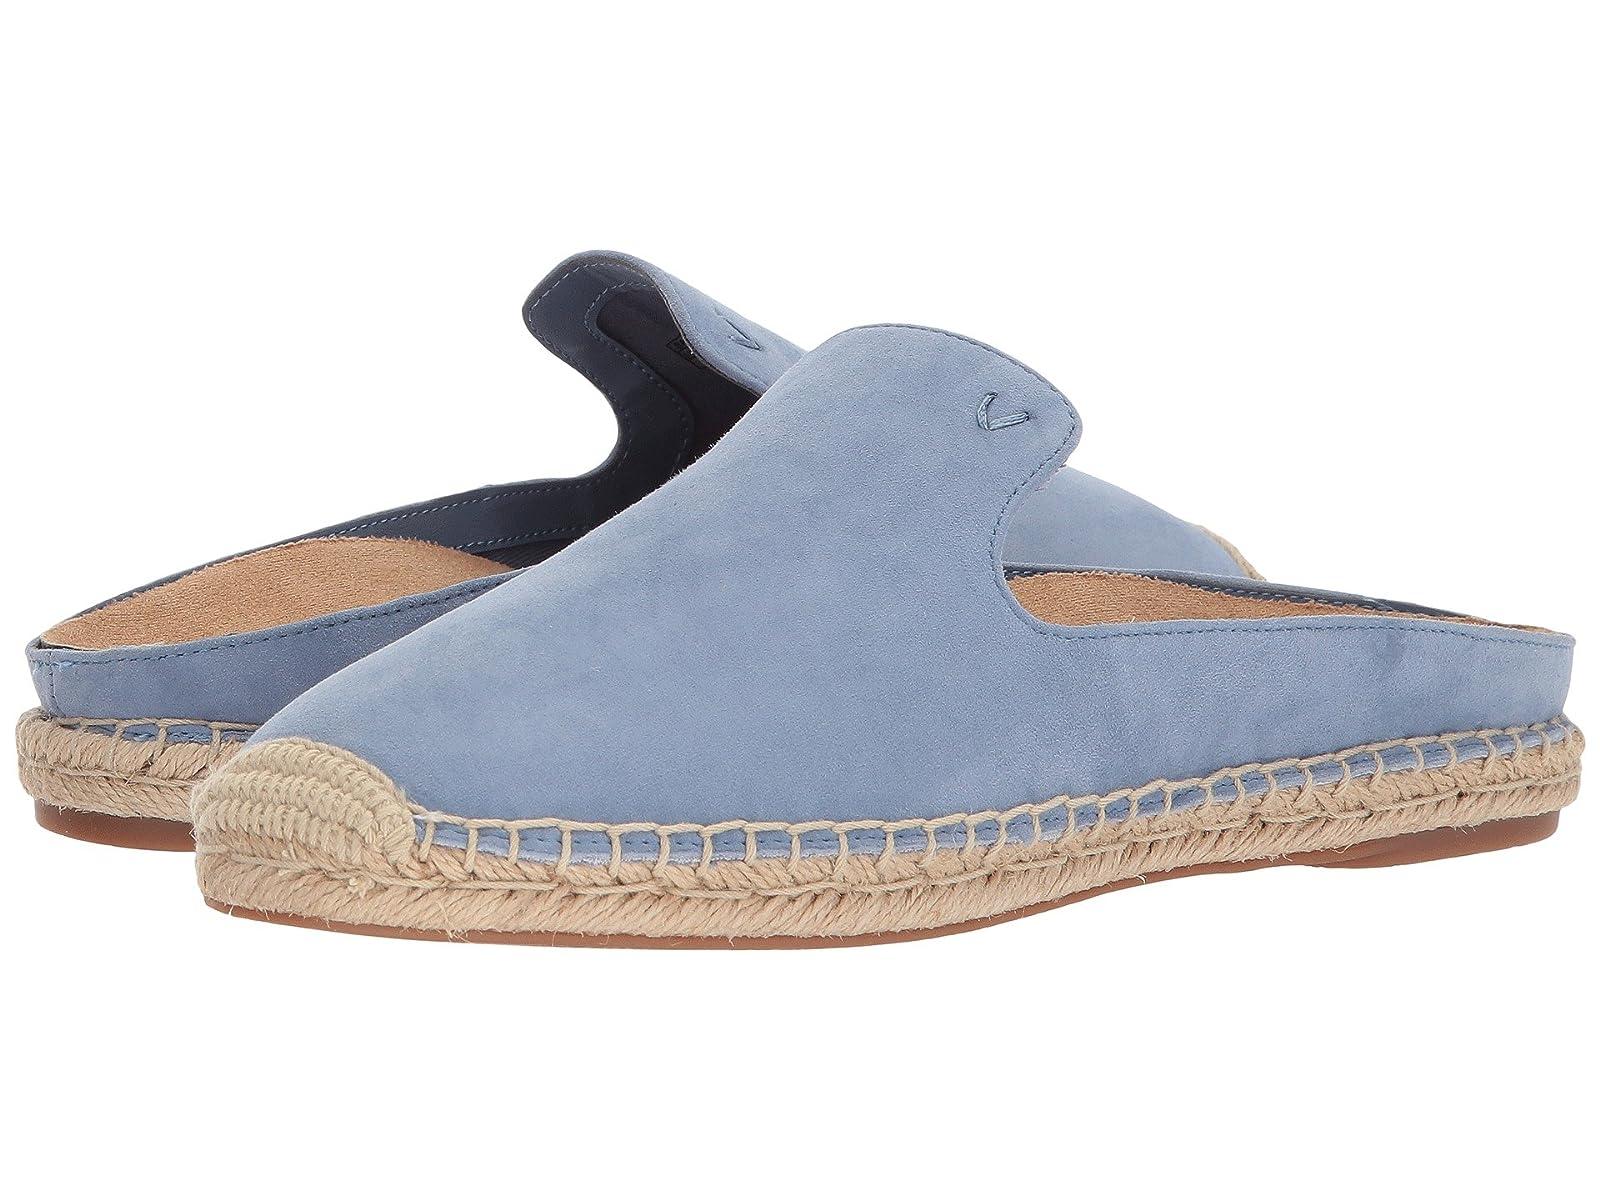 VIONIC SantoriniCheap and distinctive eye-catching shoes